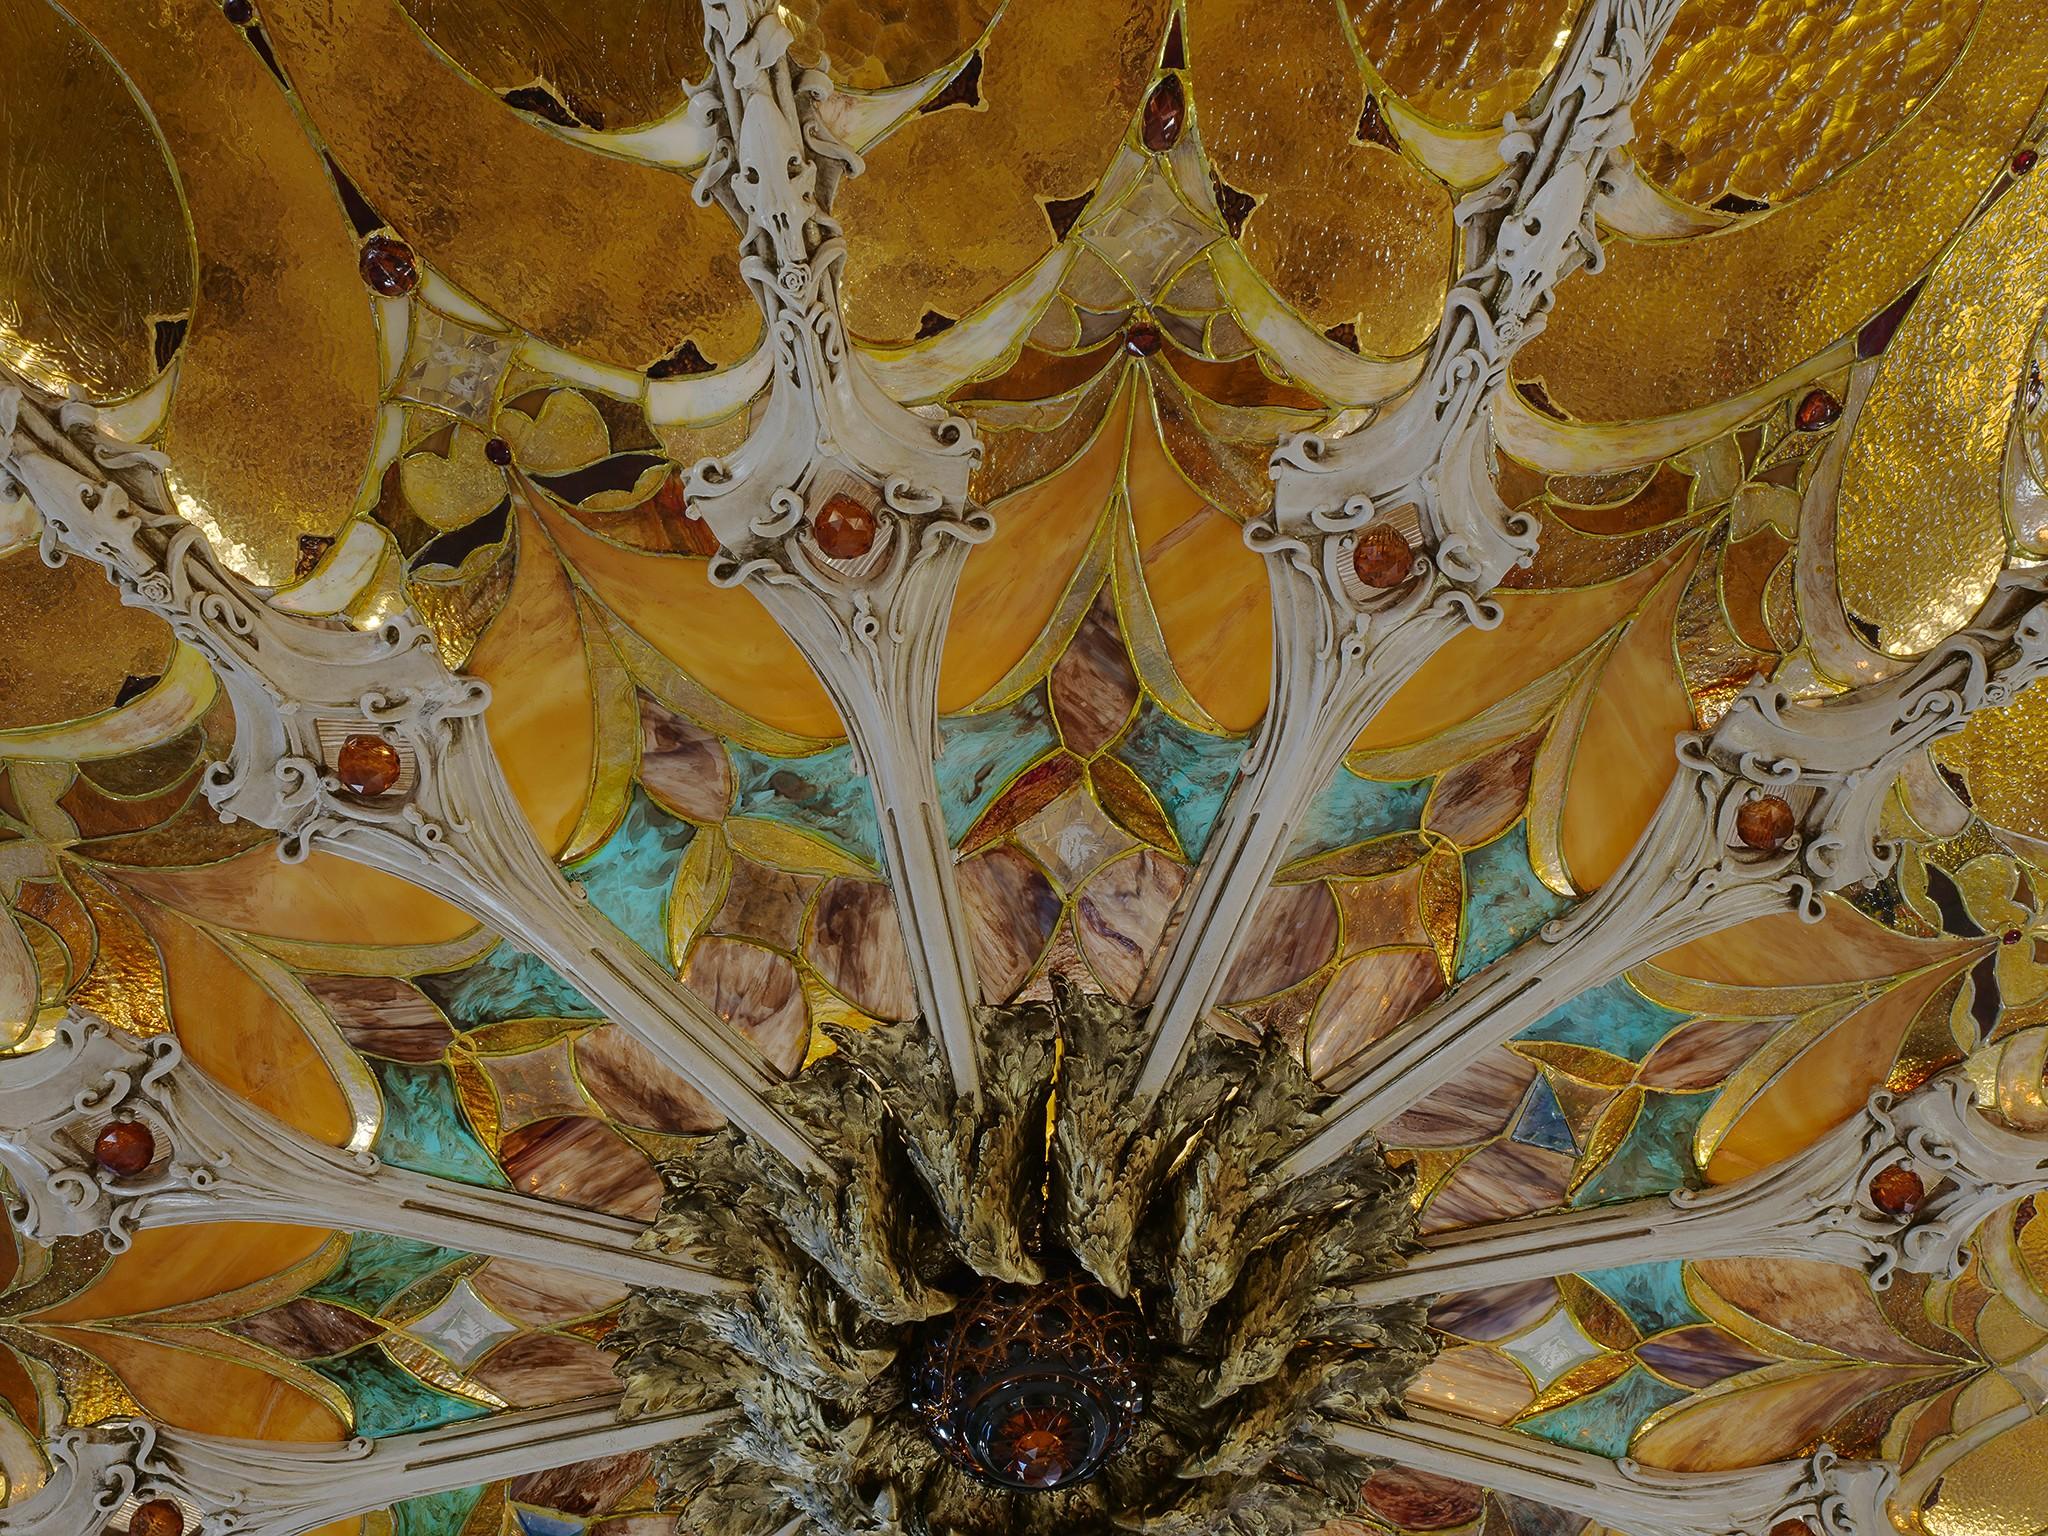 Архитектура и интерьер в работах фотографа. Кирилл Толль. Москва